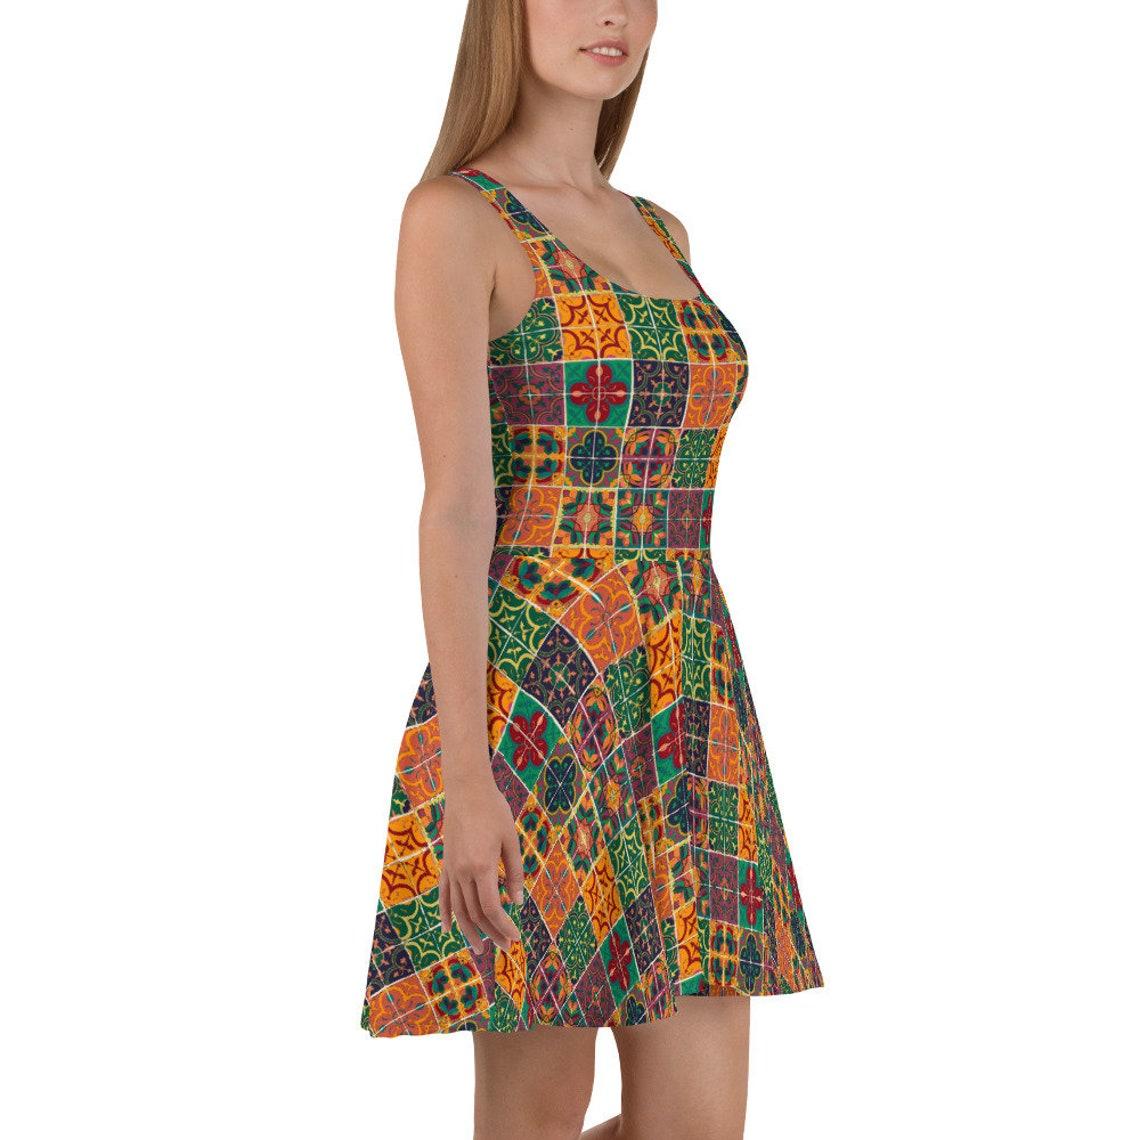 Pottery Shop Skater Dress in Spice